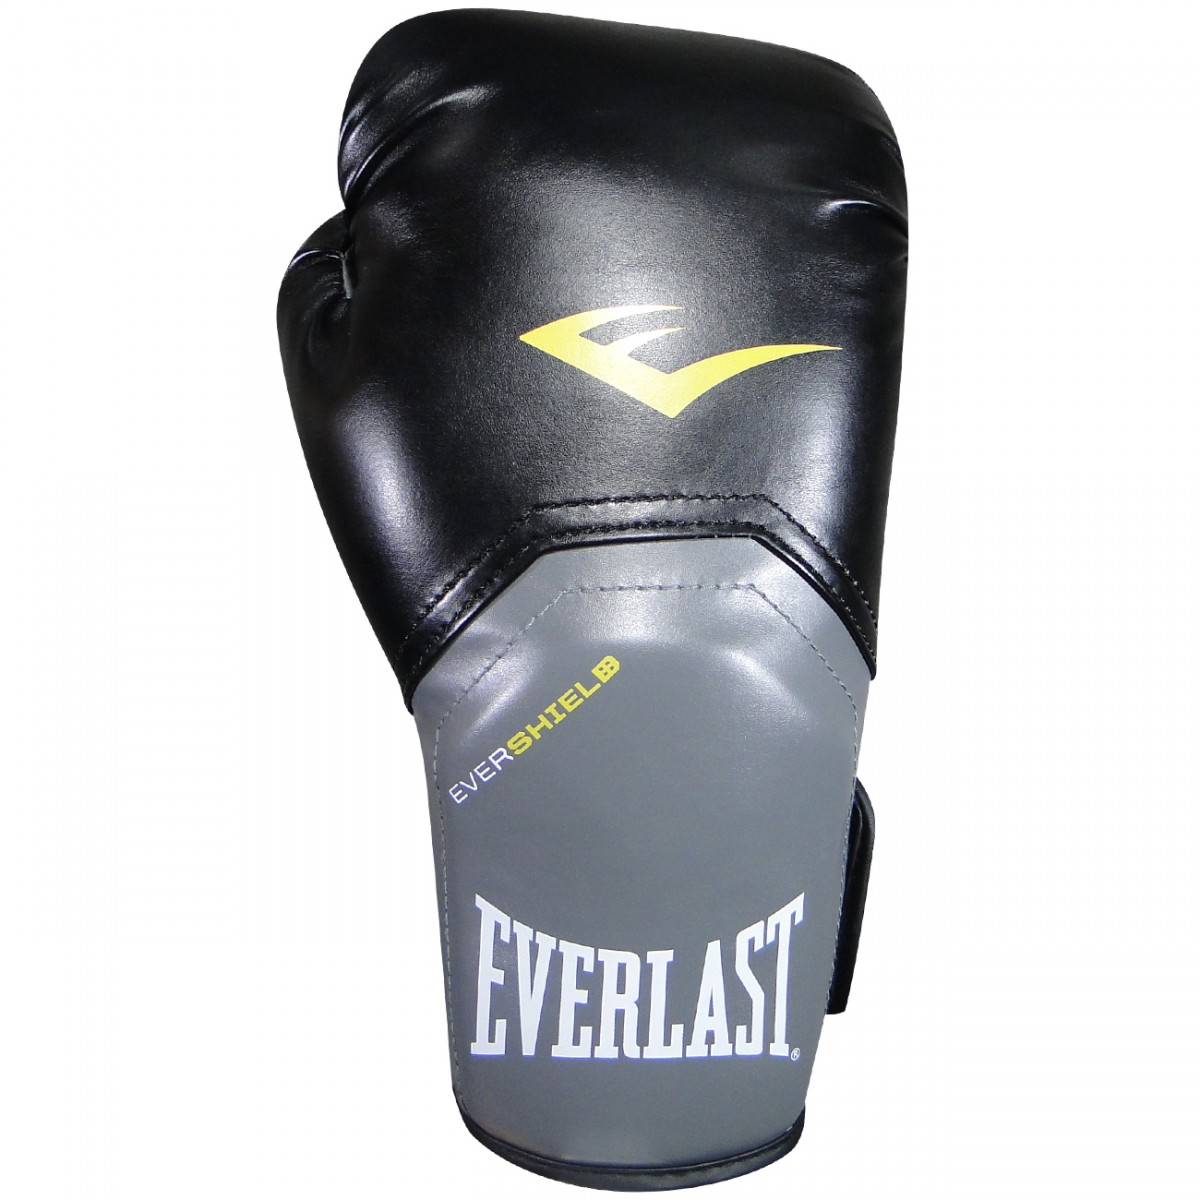 Luva Everlast Pro Style Elite 2312 - Preto Grafite - Chuteira Nike ... e52cc59949a2c